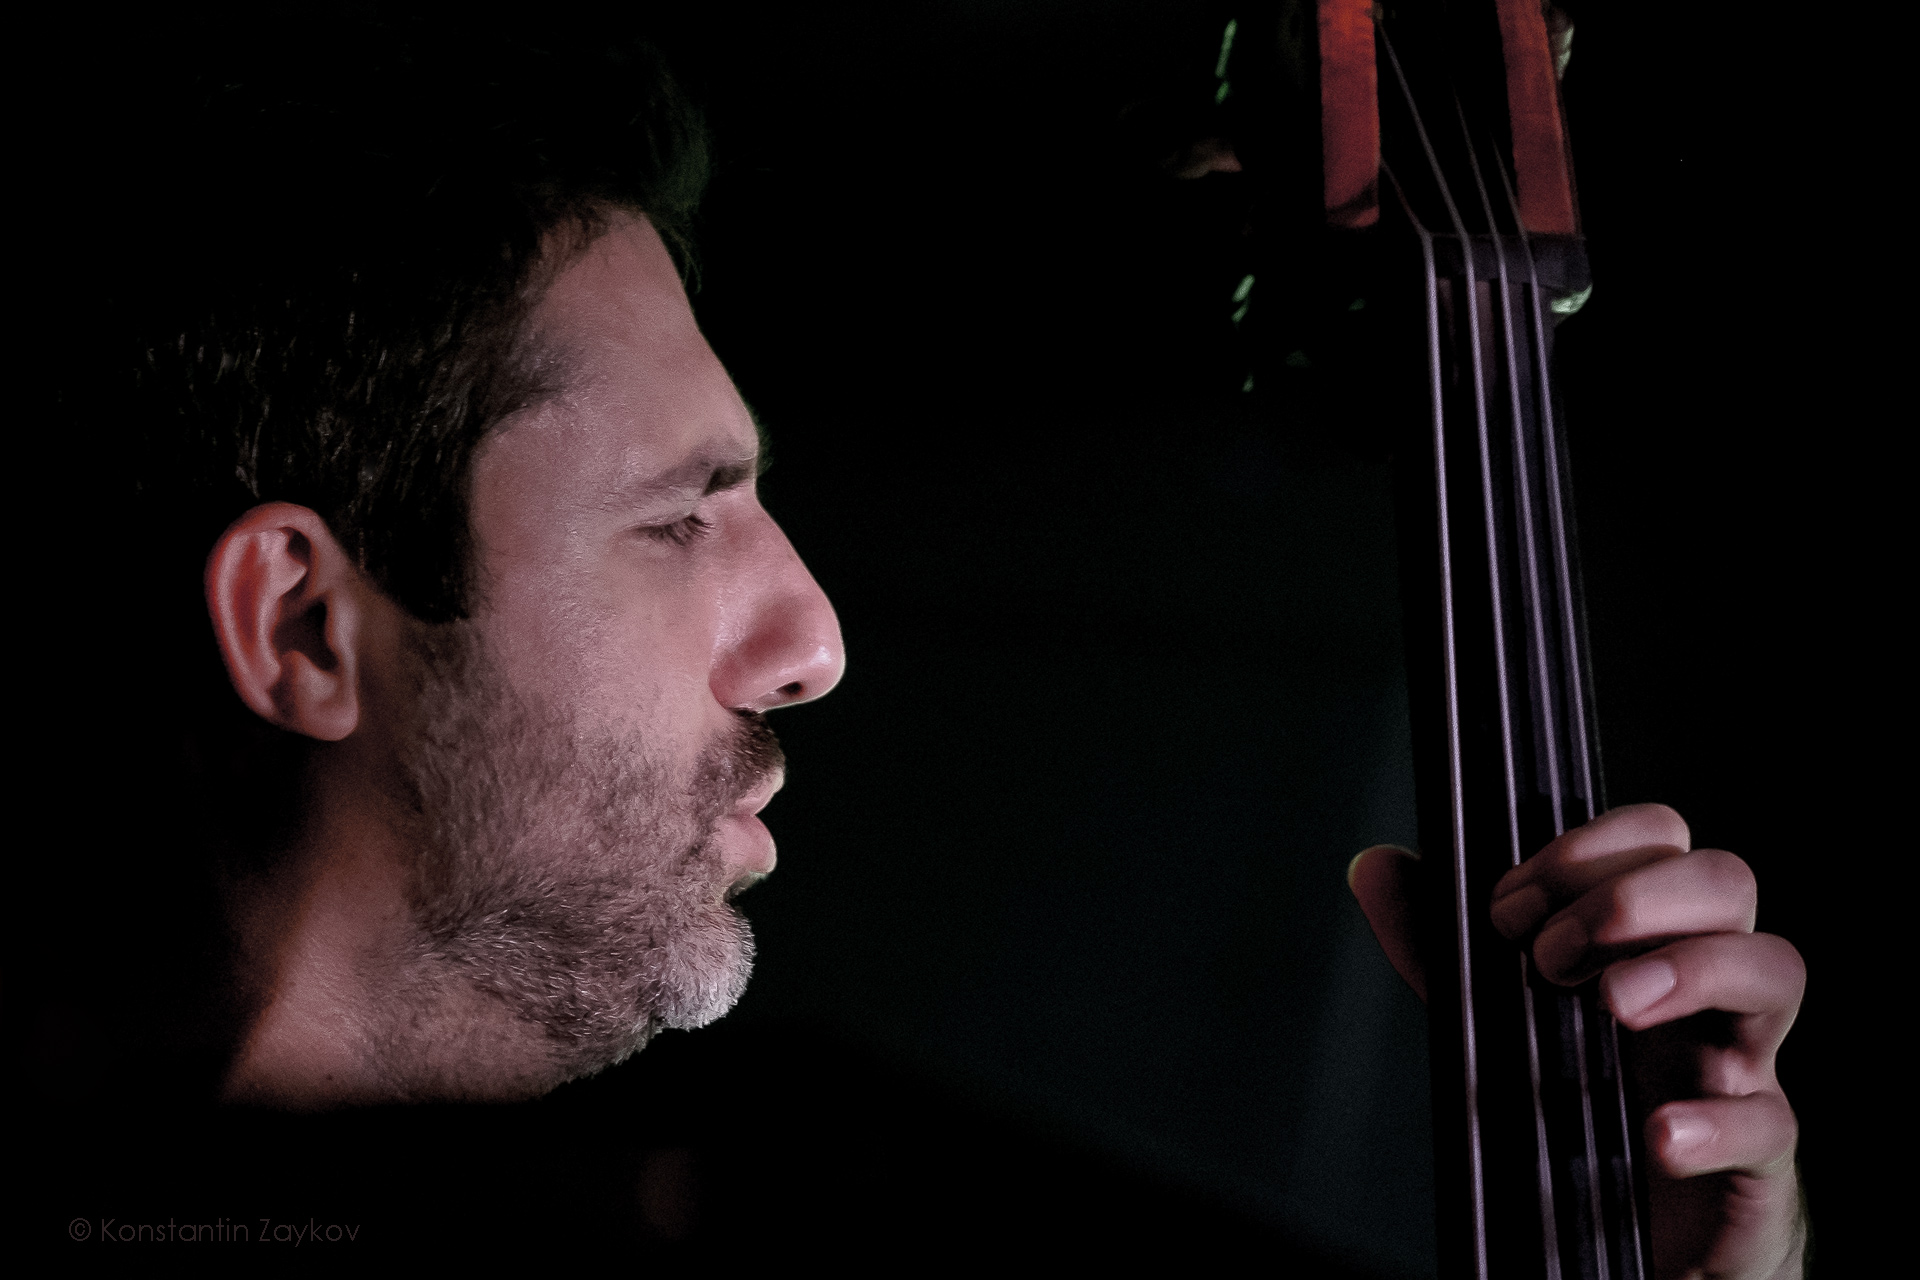 Dimitar Karamfilov during a jazz concert in Burgas, Bulgaria in 2019